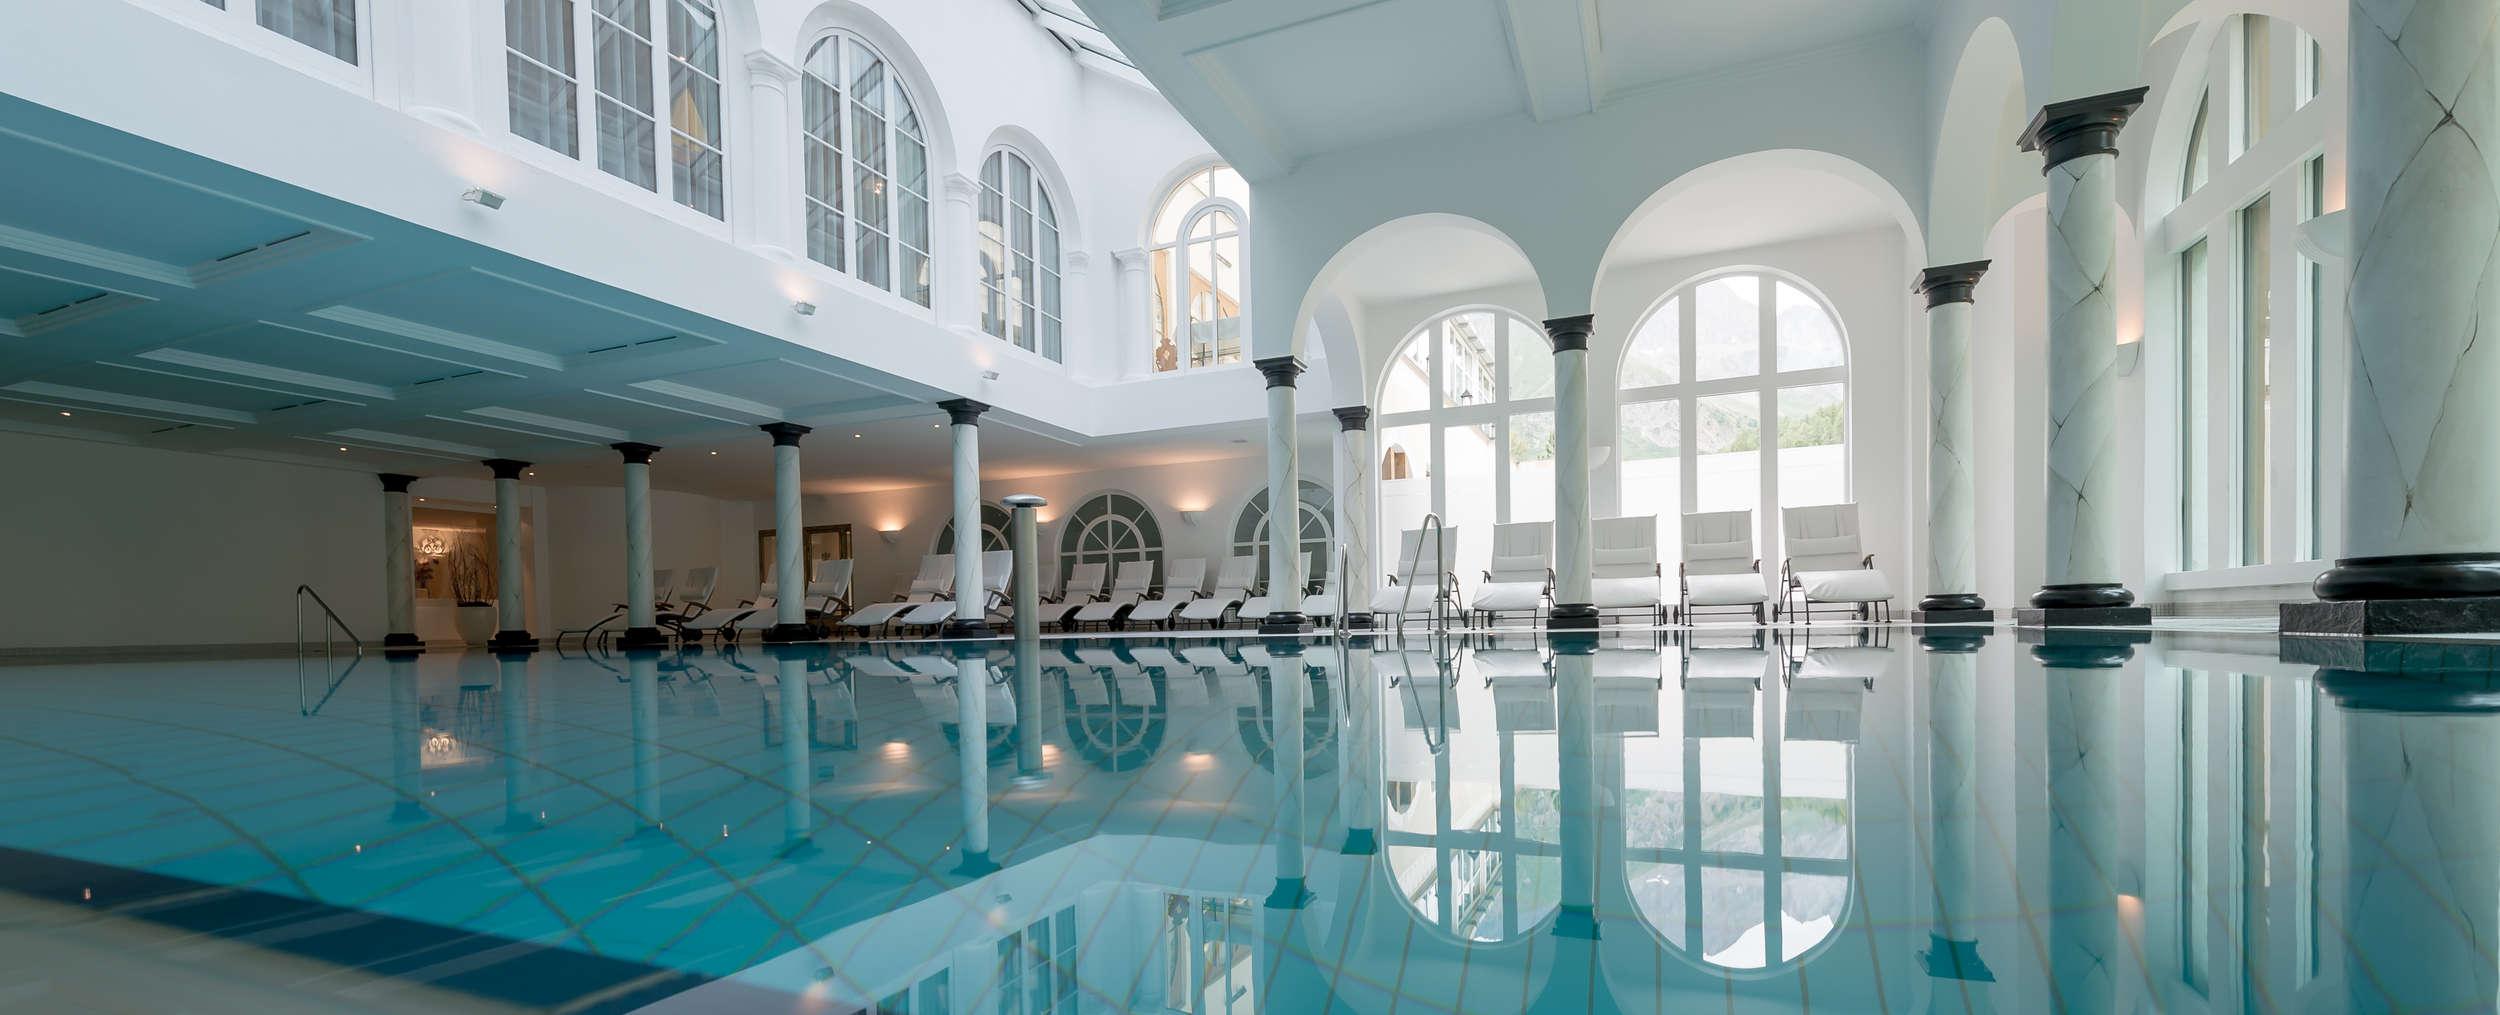 Alpiner Spa Chalet Silvretta Hotel Spa